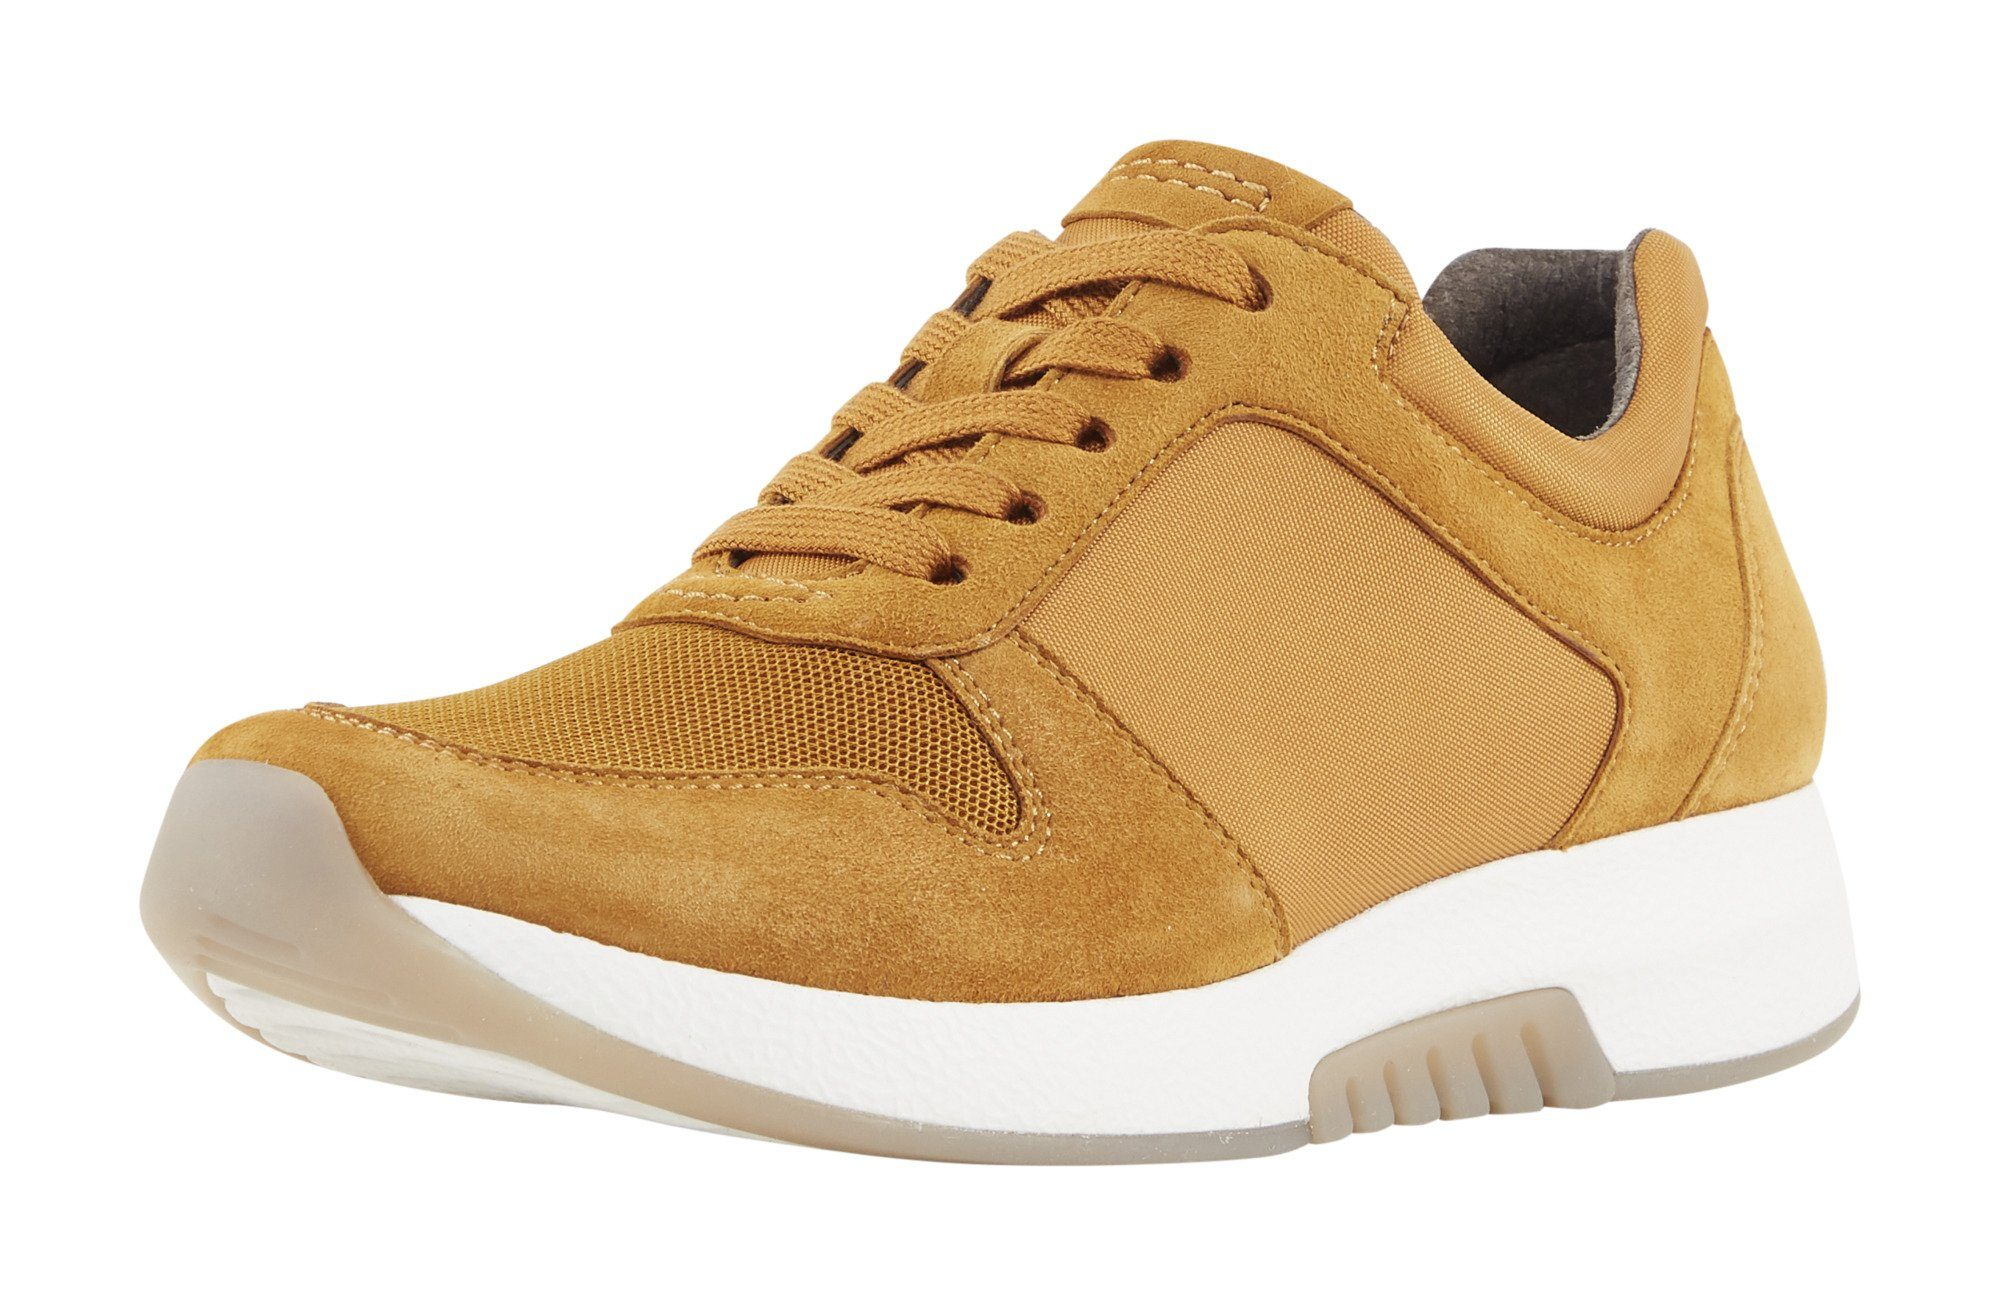 GABOR Sneaker Rolling soft, besonders flexibel | OTTO